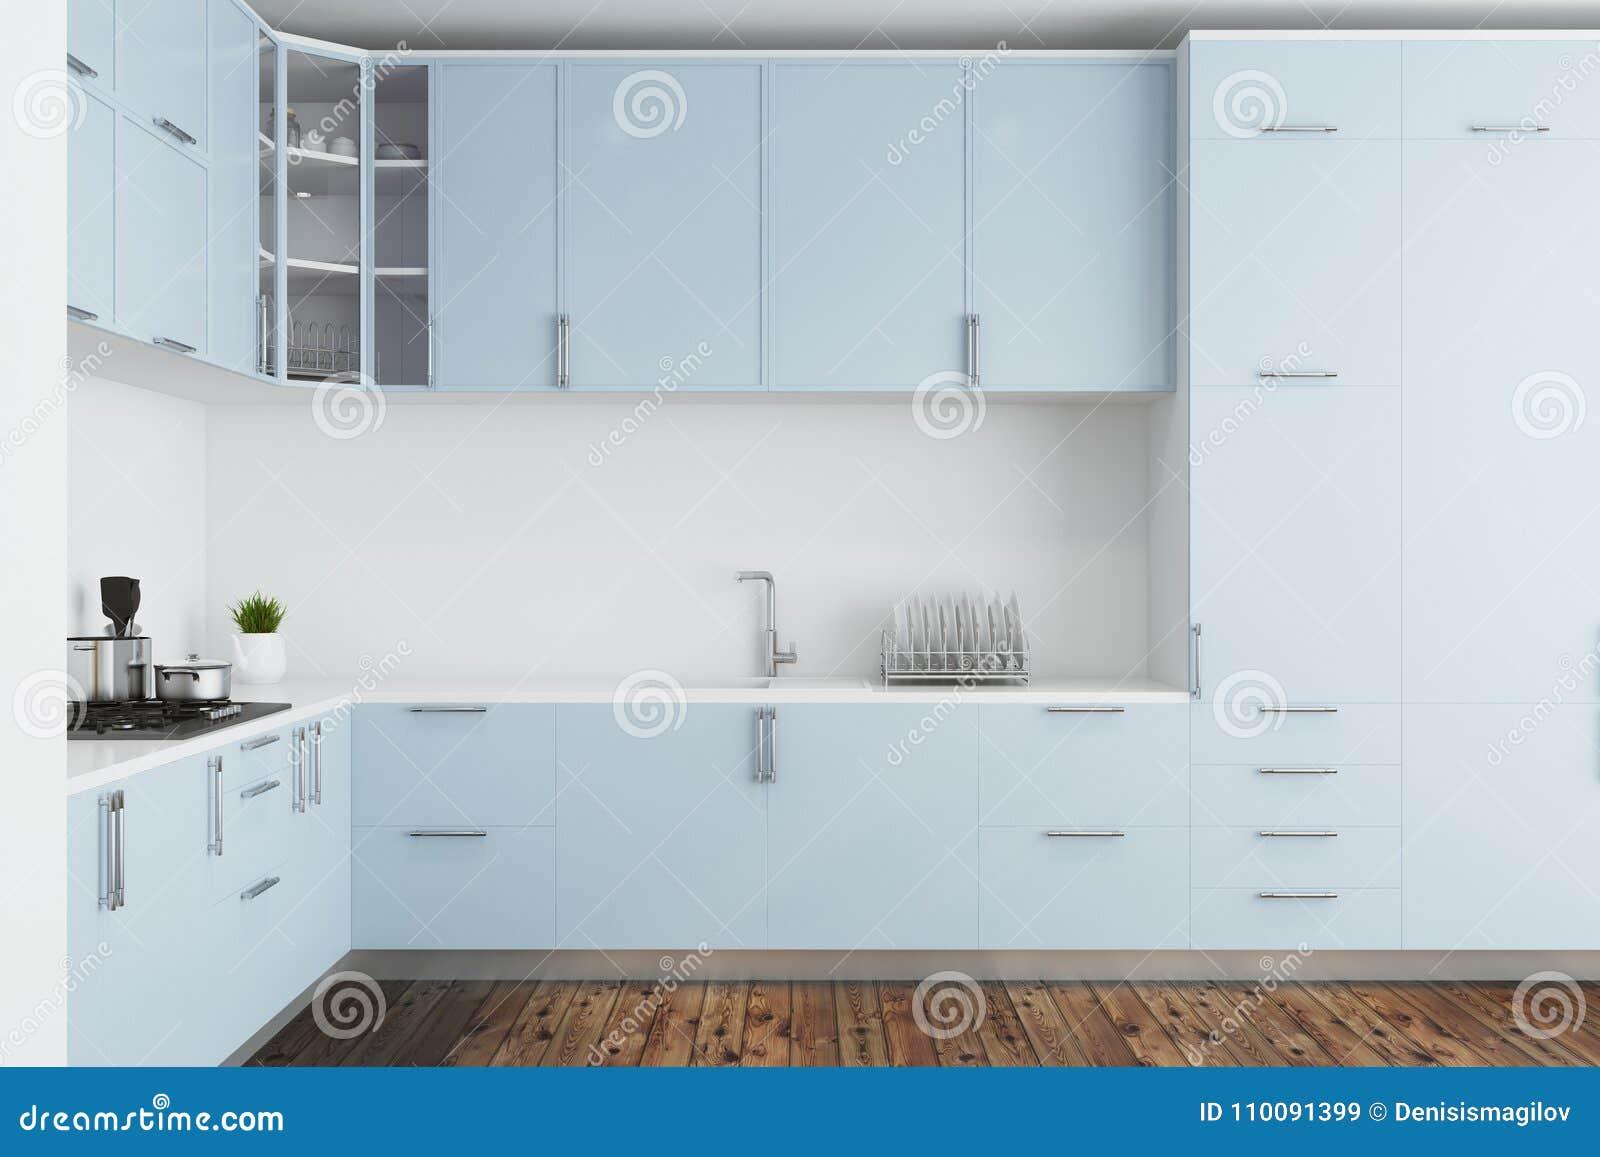 White Kitchen, Blue Countertops Stock Illustration - Illustration of ...